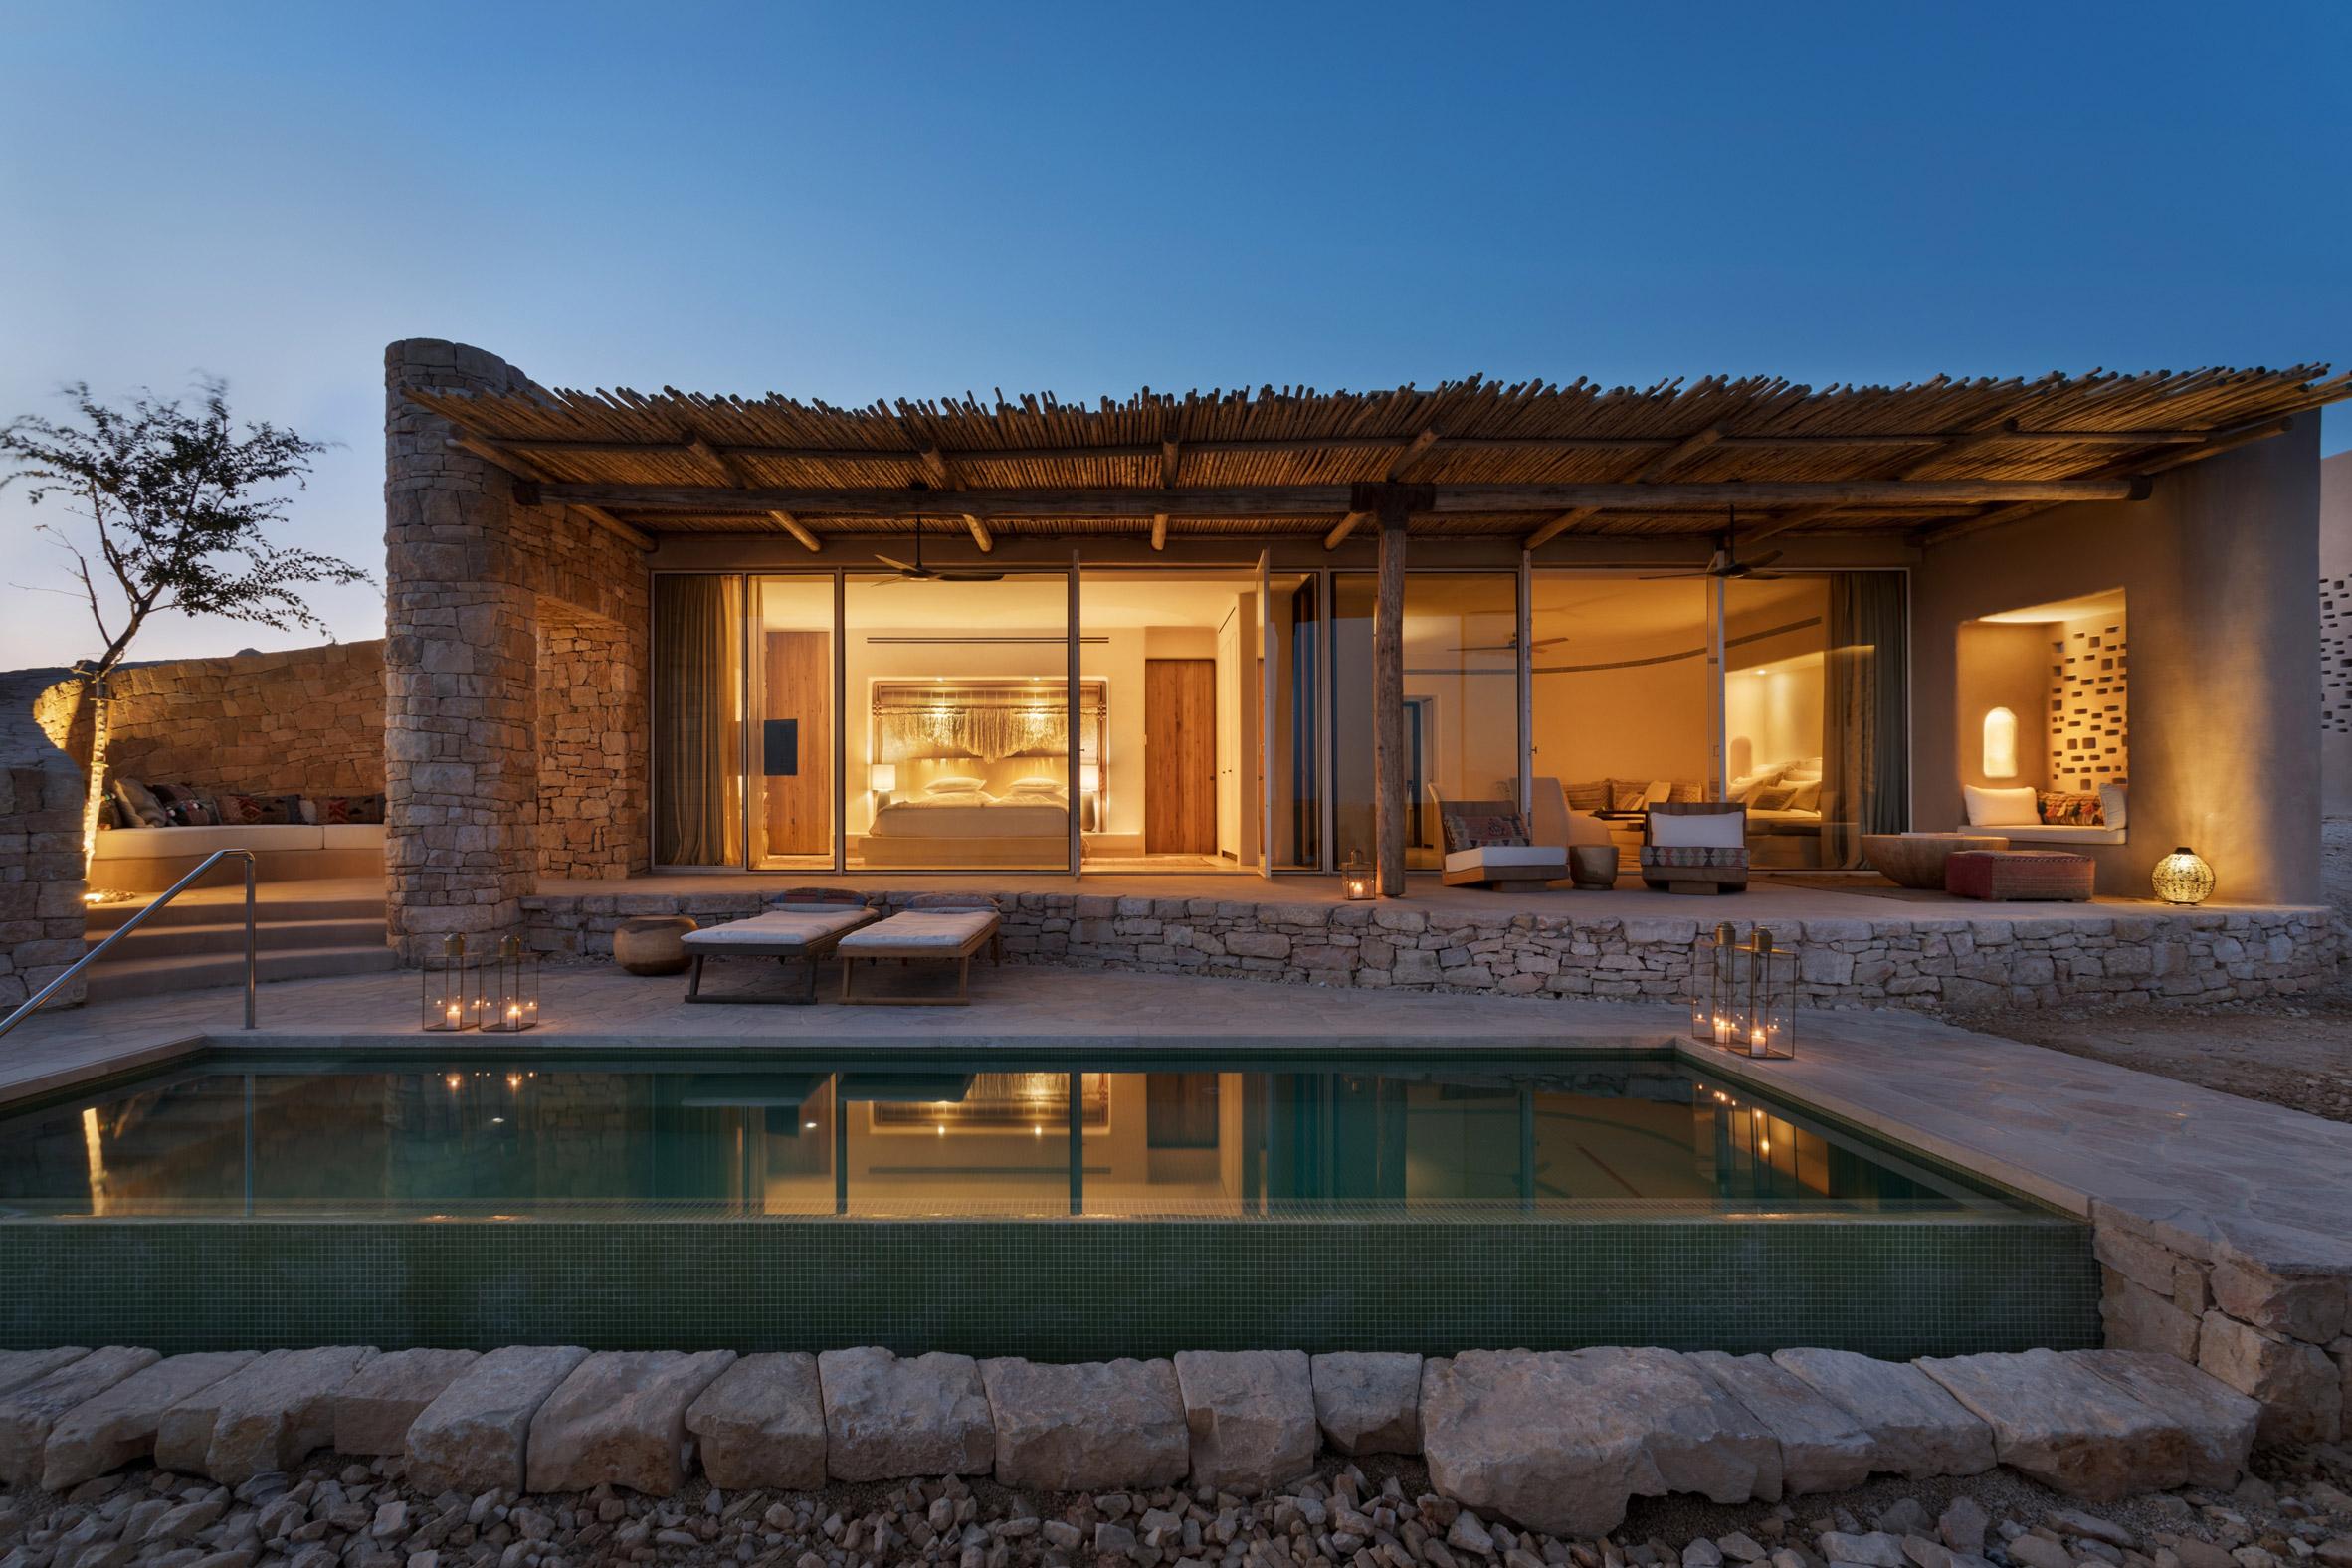 Six Senses Shaharut by Plesner Architects